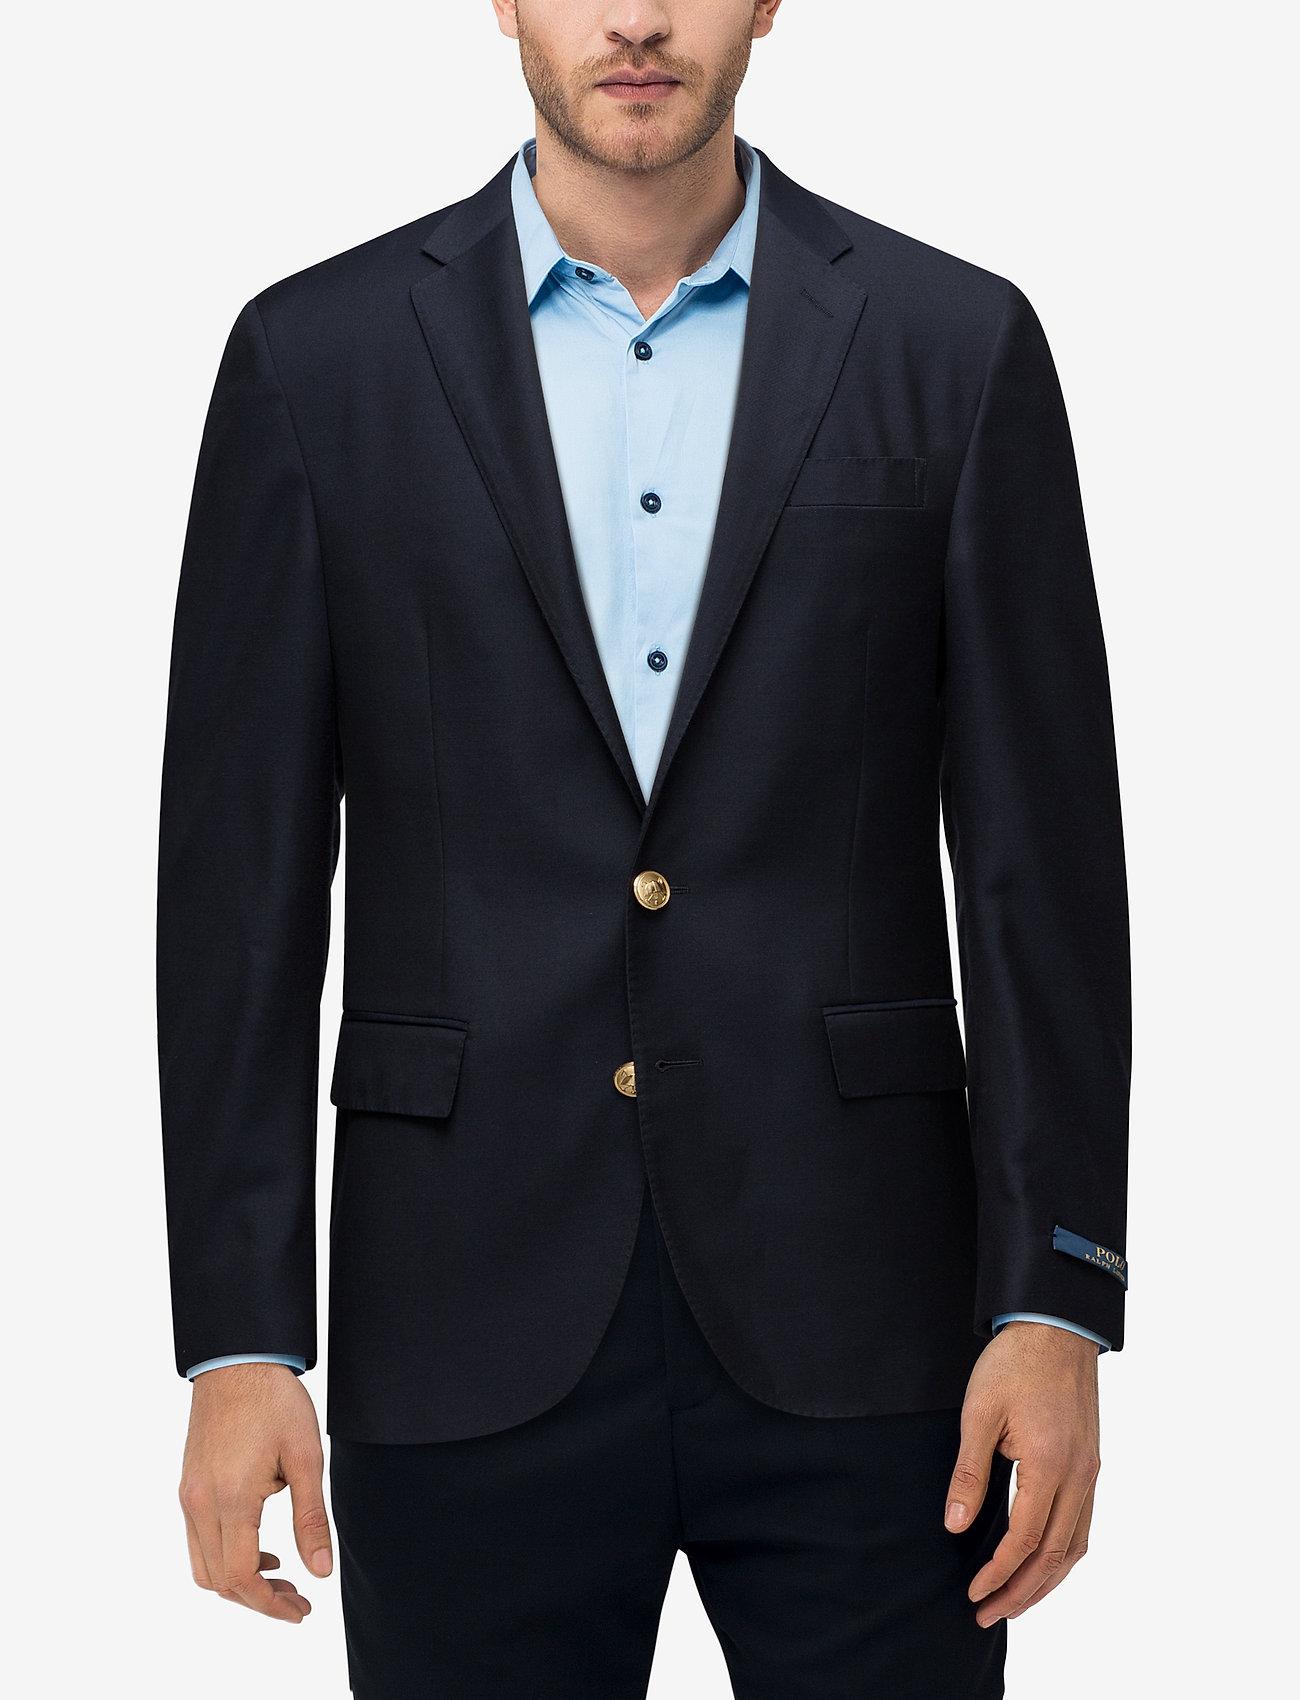 Polo Ralph Lauren Polo Wool Twill Sport Coat - CLASSIC NAVY